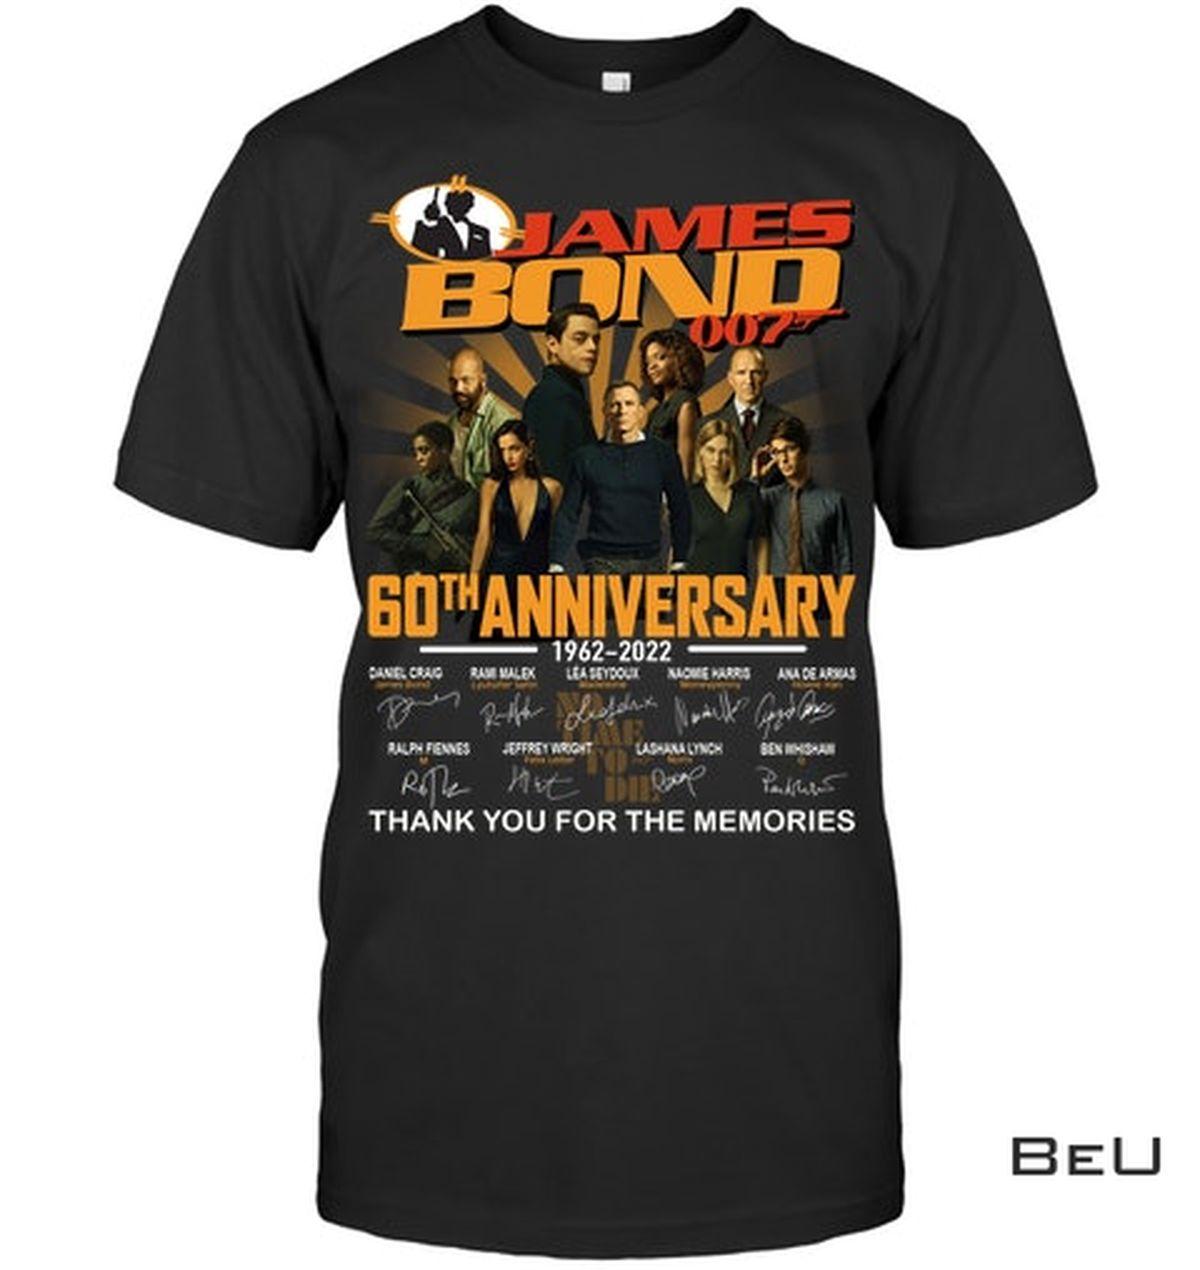 James Bond 007 60th Anniversary Shirt